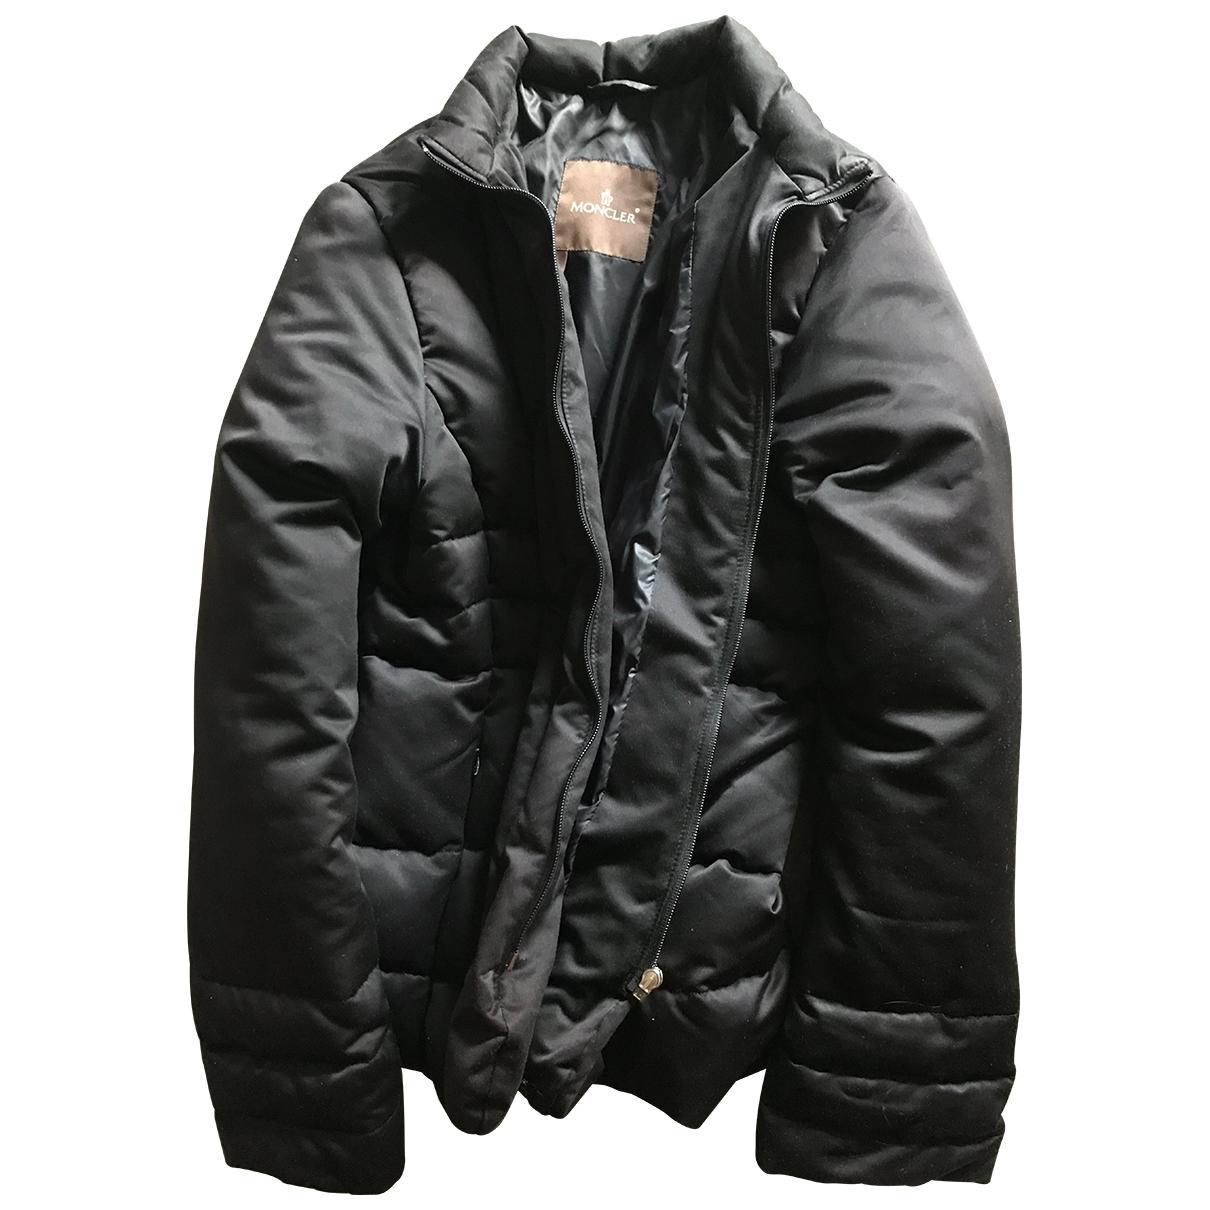 Moncler \N Lederjacke in  Schwarz Polyester